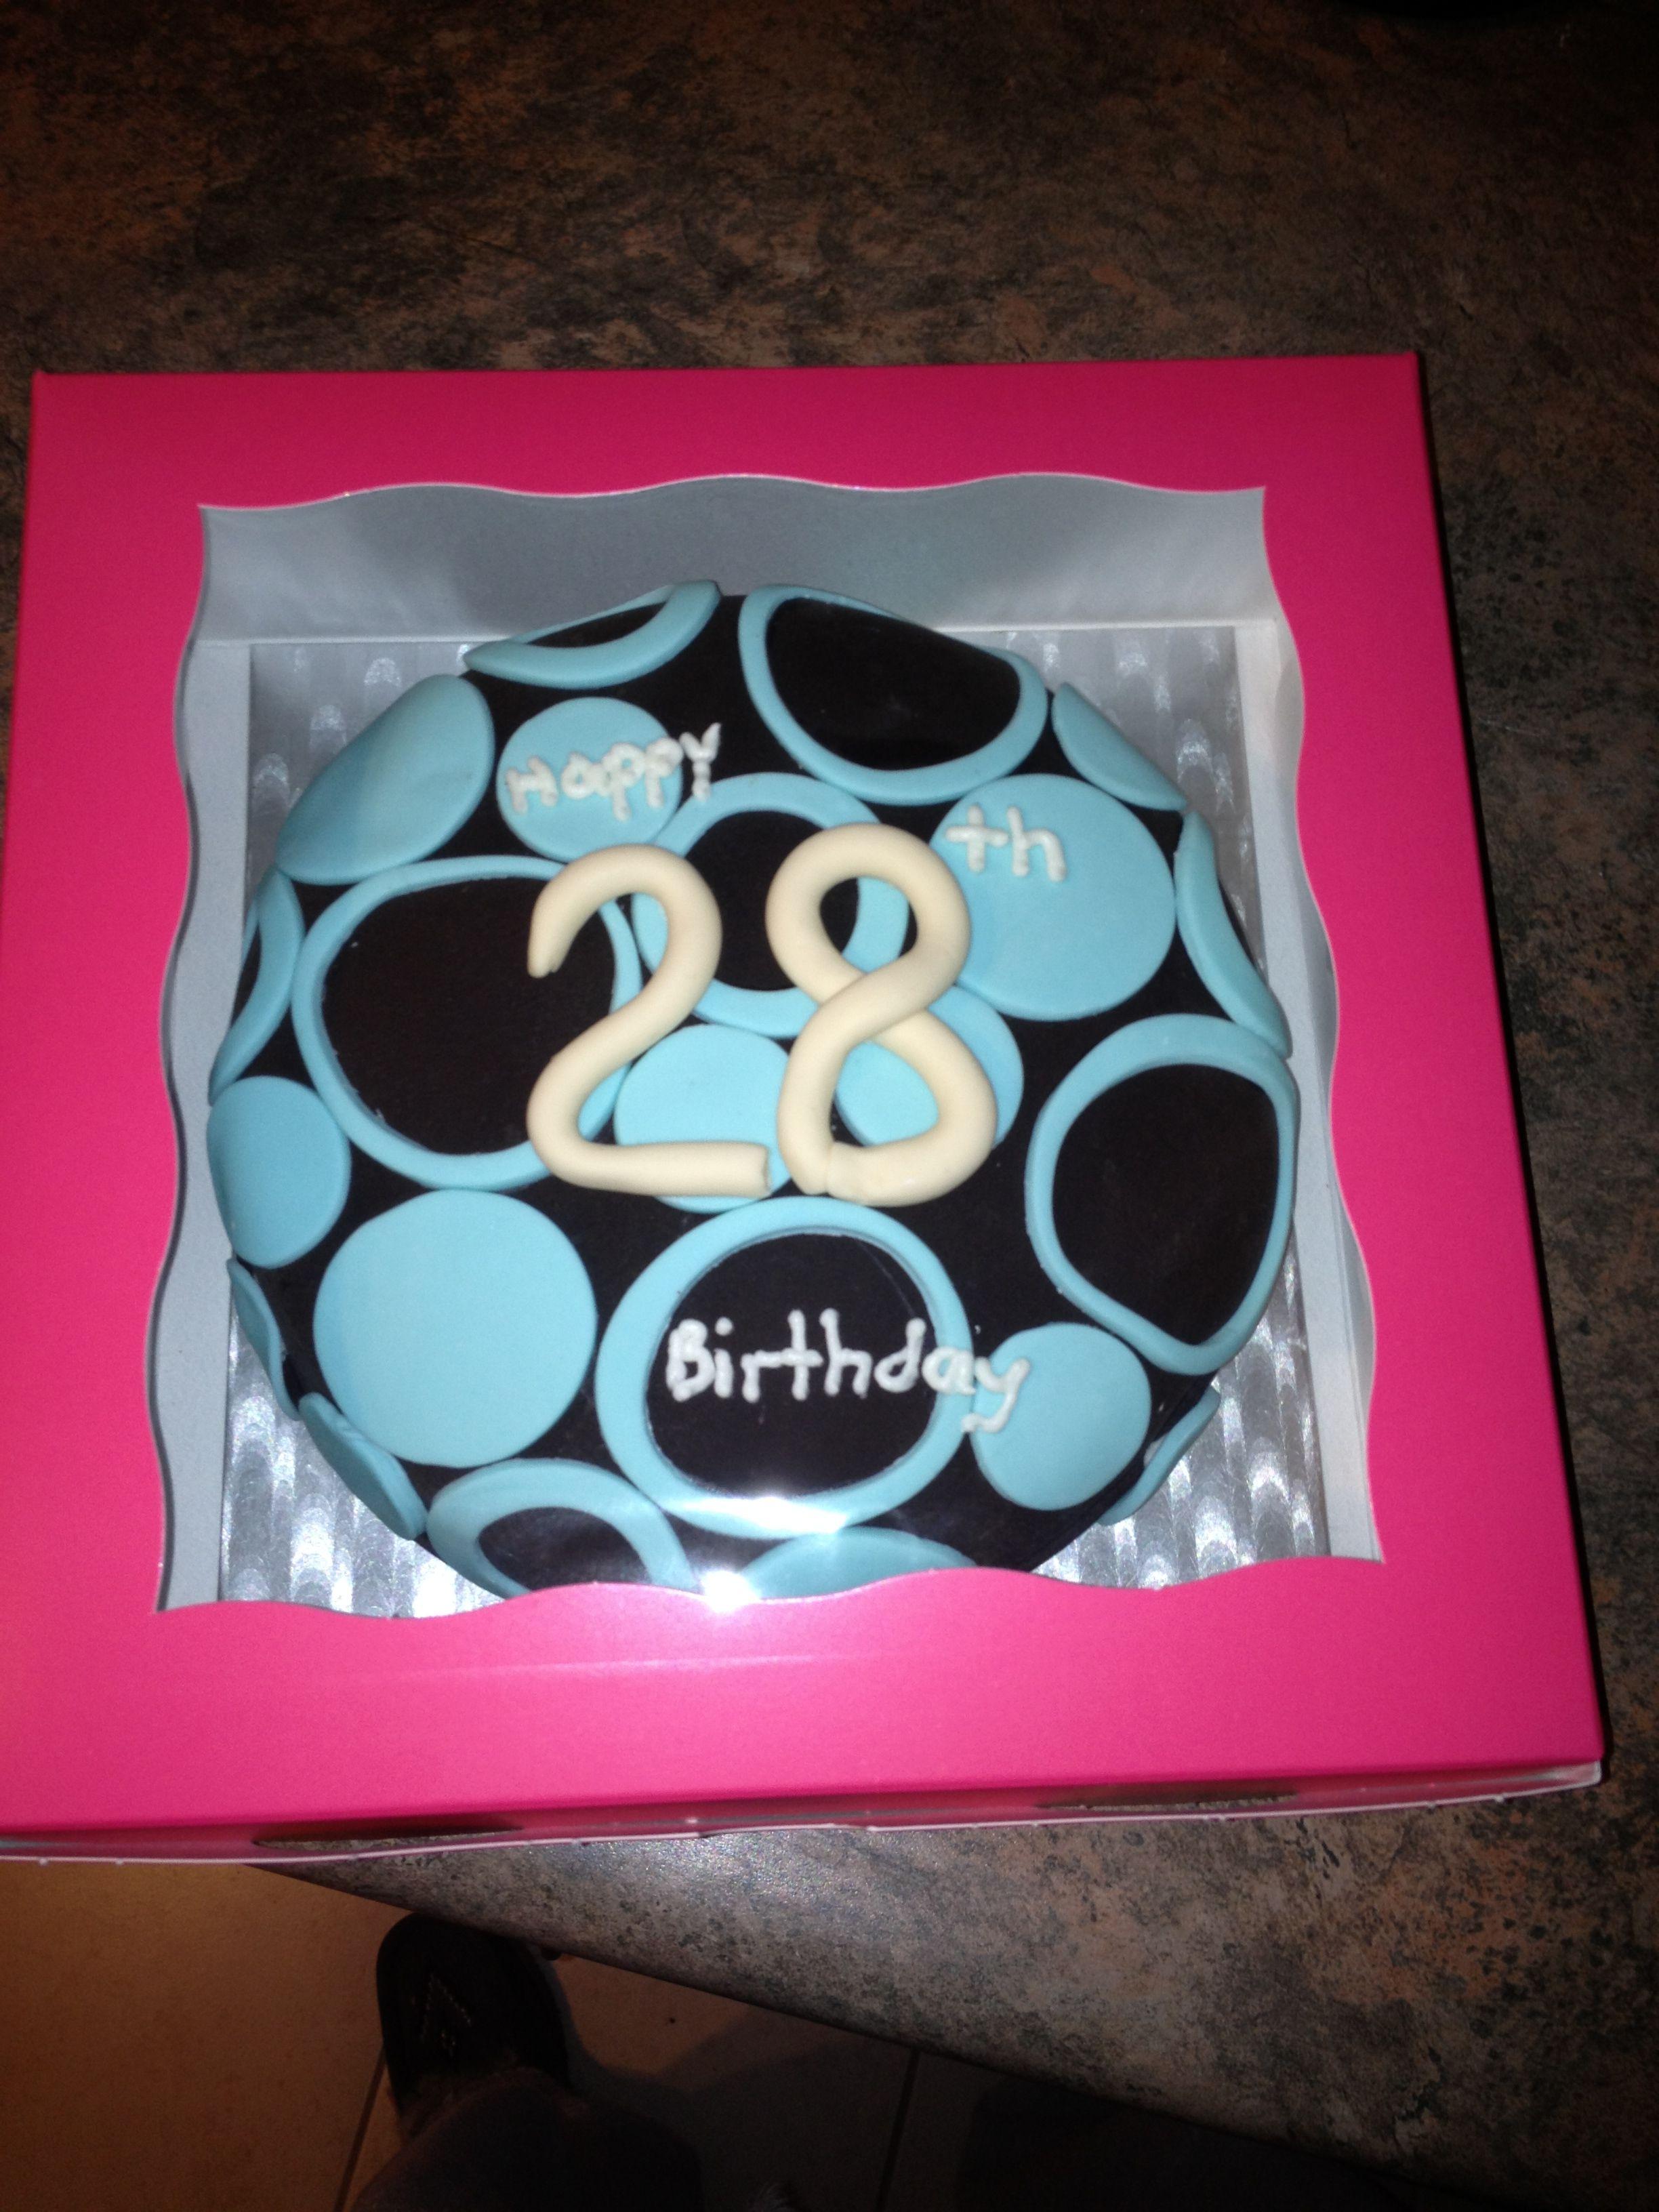 Tanyas 28th Birthday Cake